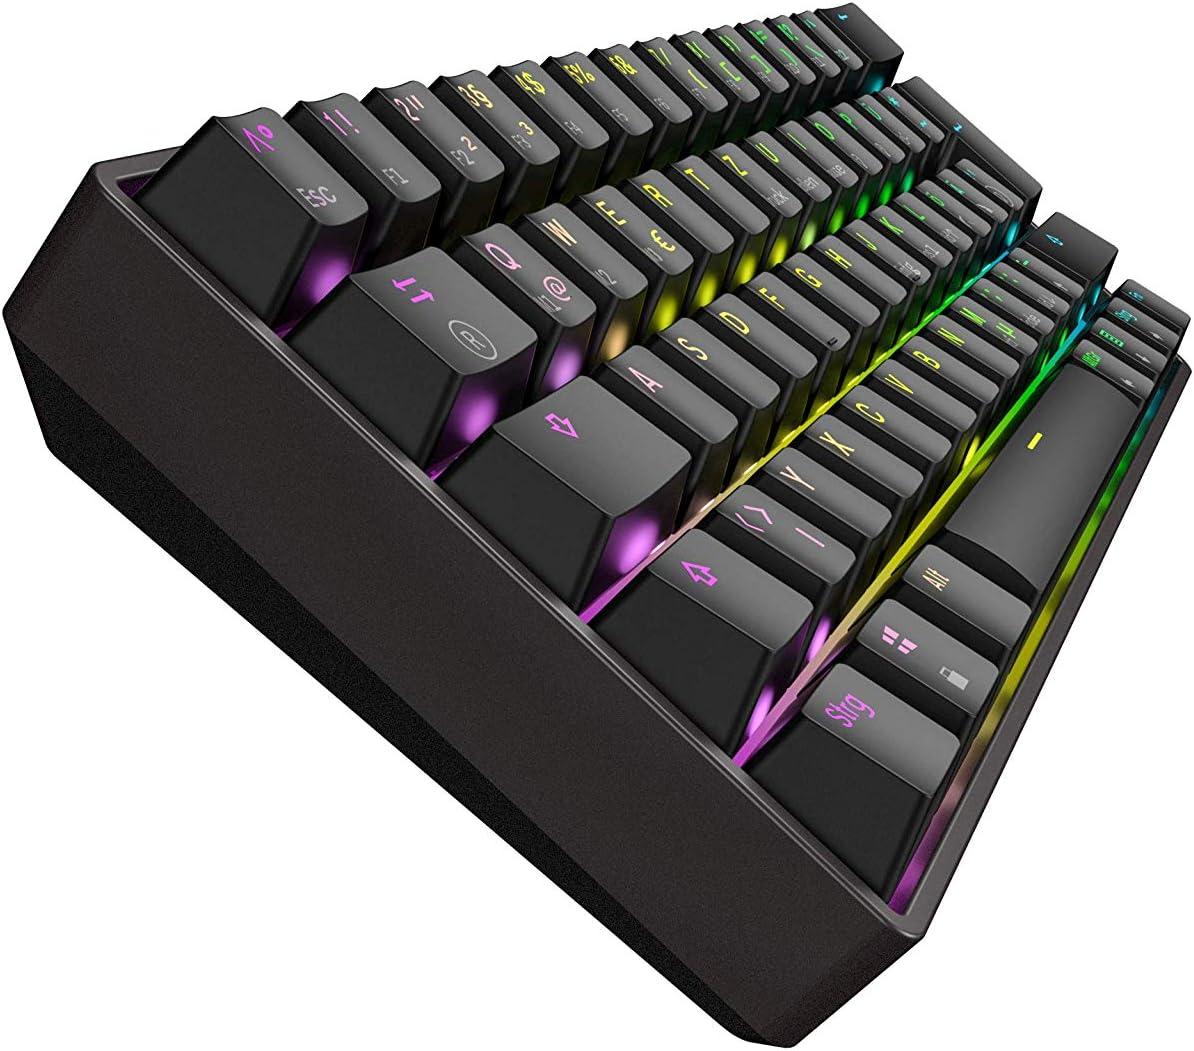 Mizar MZ60 Luna Teclado Mecánico Hotswap para Videojuegos - 62 Teclas LED RGB Multicolor Retroiluminadas para PC/Mac Gamer - Diseño Reino Unido ISO UK ...